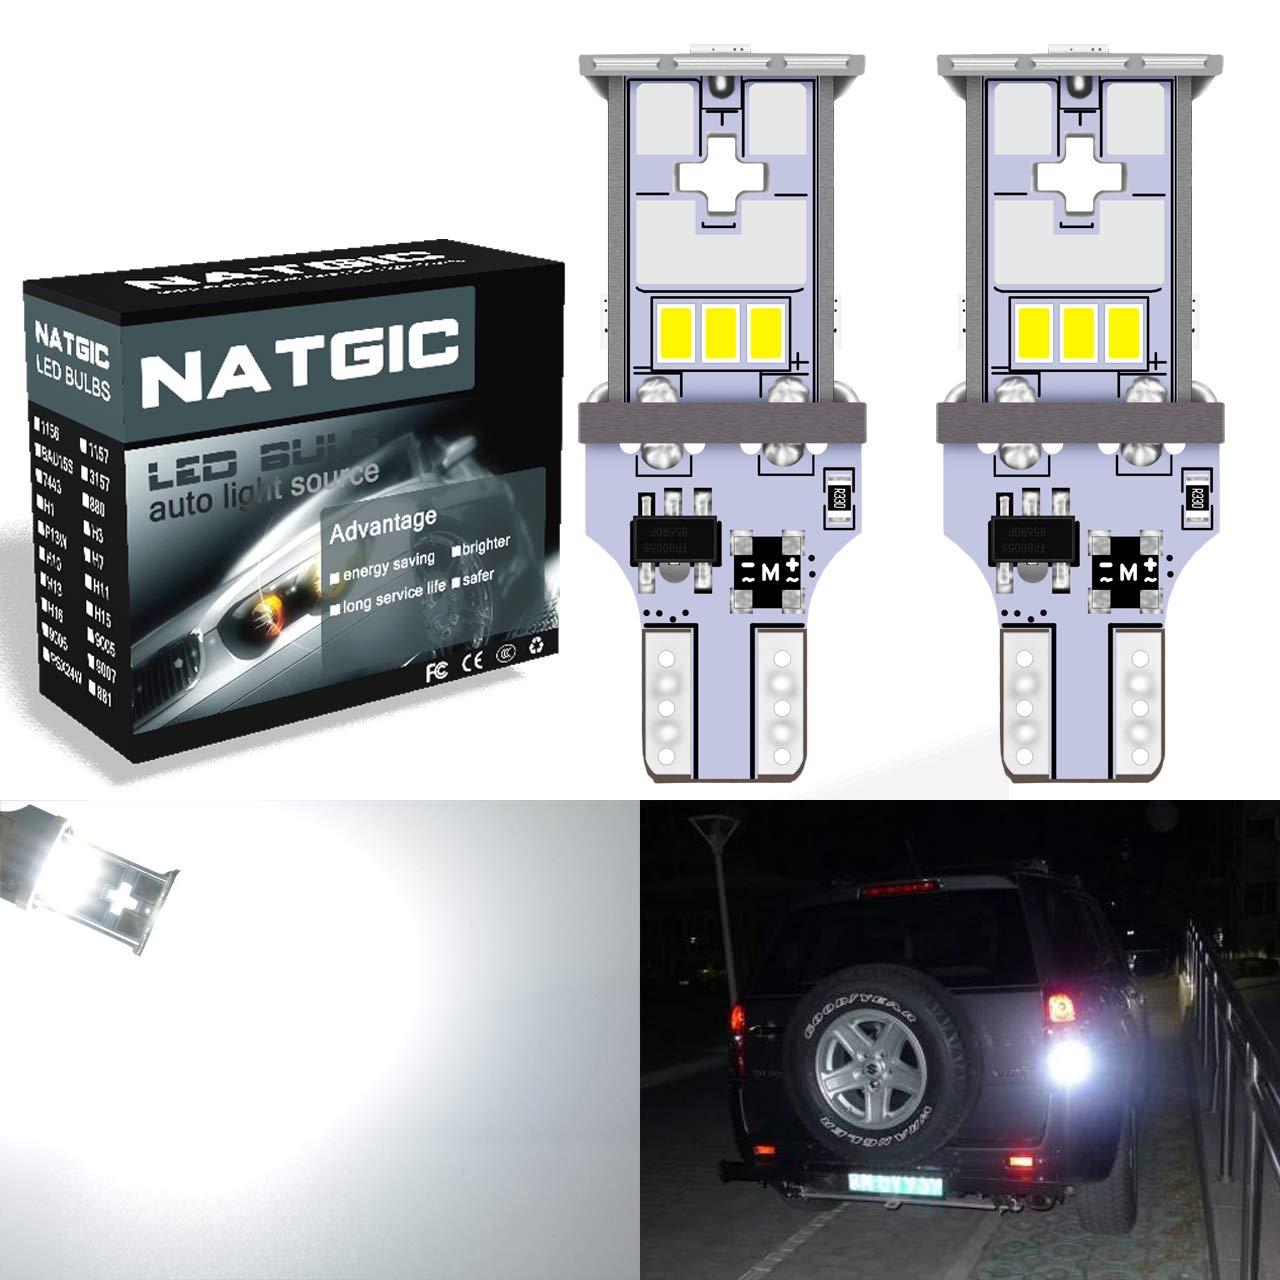 NATGIC T10 168 LED Bulb 10pcs 250Lumens 6000K Super Bright 3014 24-EX Chipsets CanBus Erro Free 194 2825 175 921 912 LED Replacement Light for Car Interior Light Turn Signal Bulb Side Marker Lamp Festoon Map Reading Light 2.5W 12V